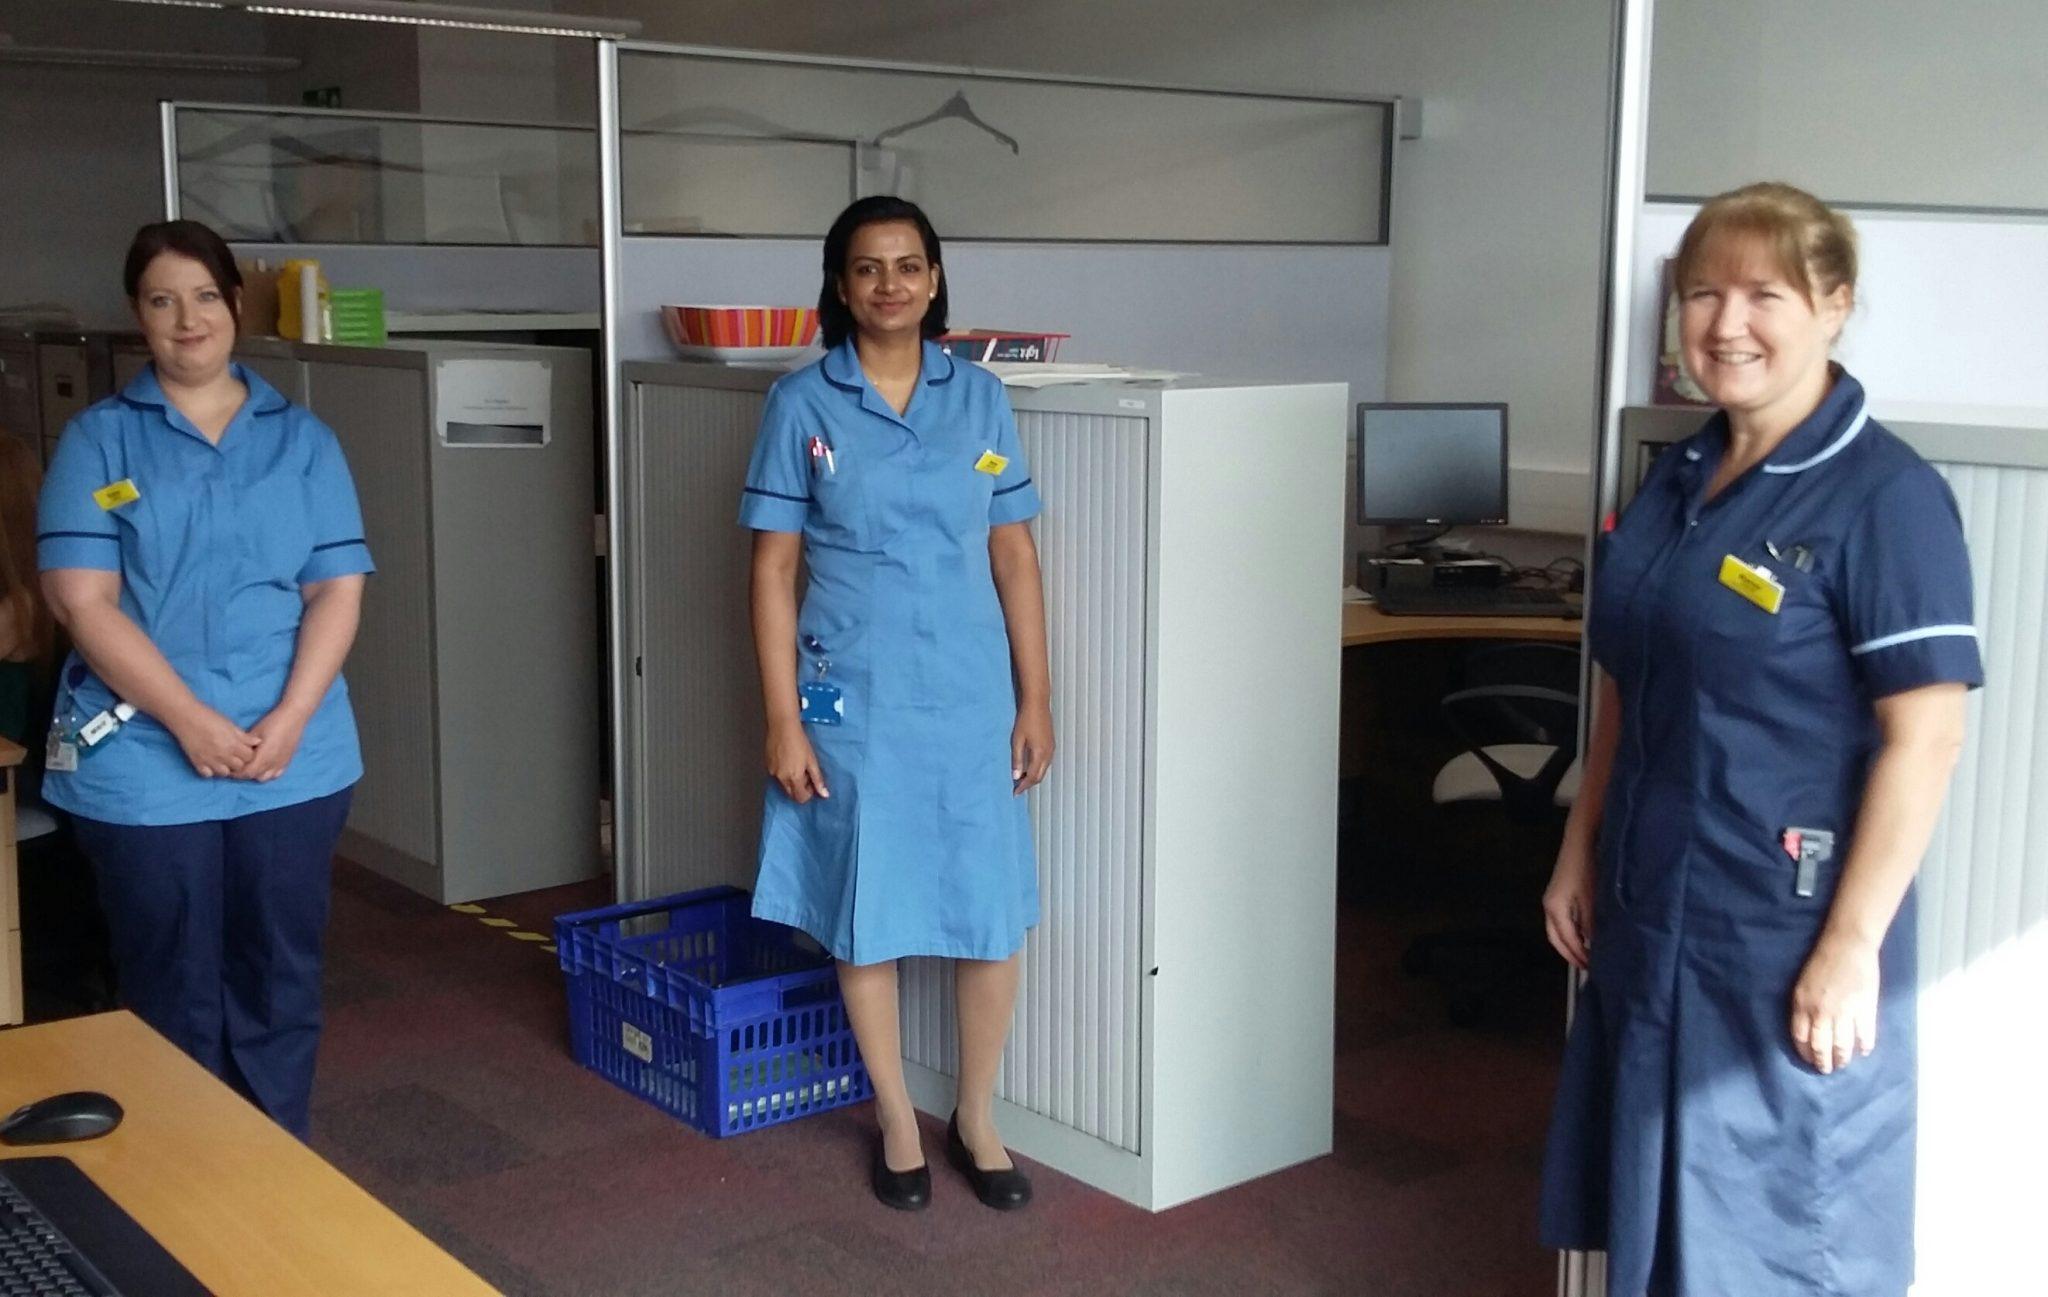 Diabetes nursing team